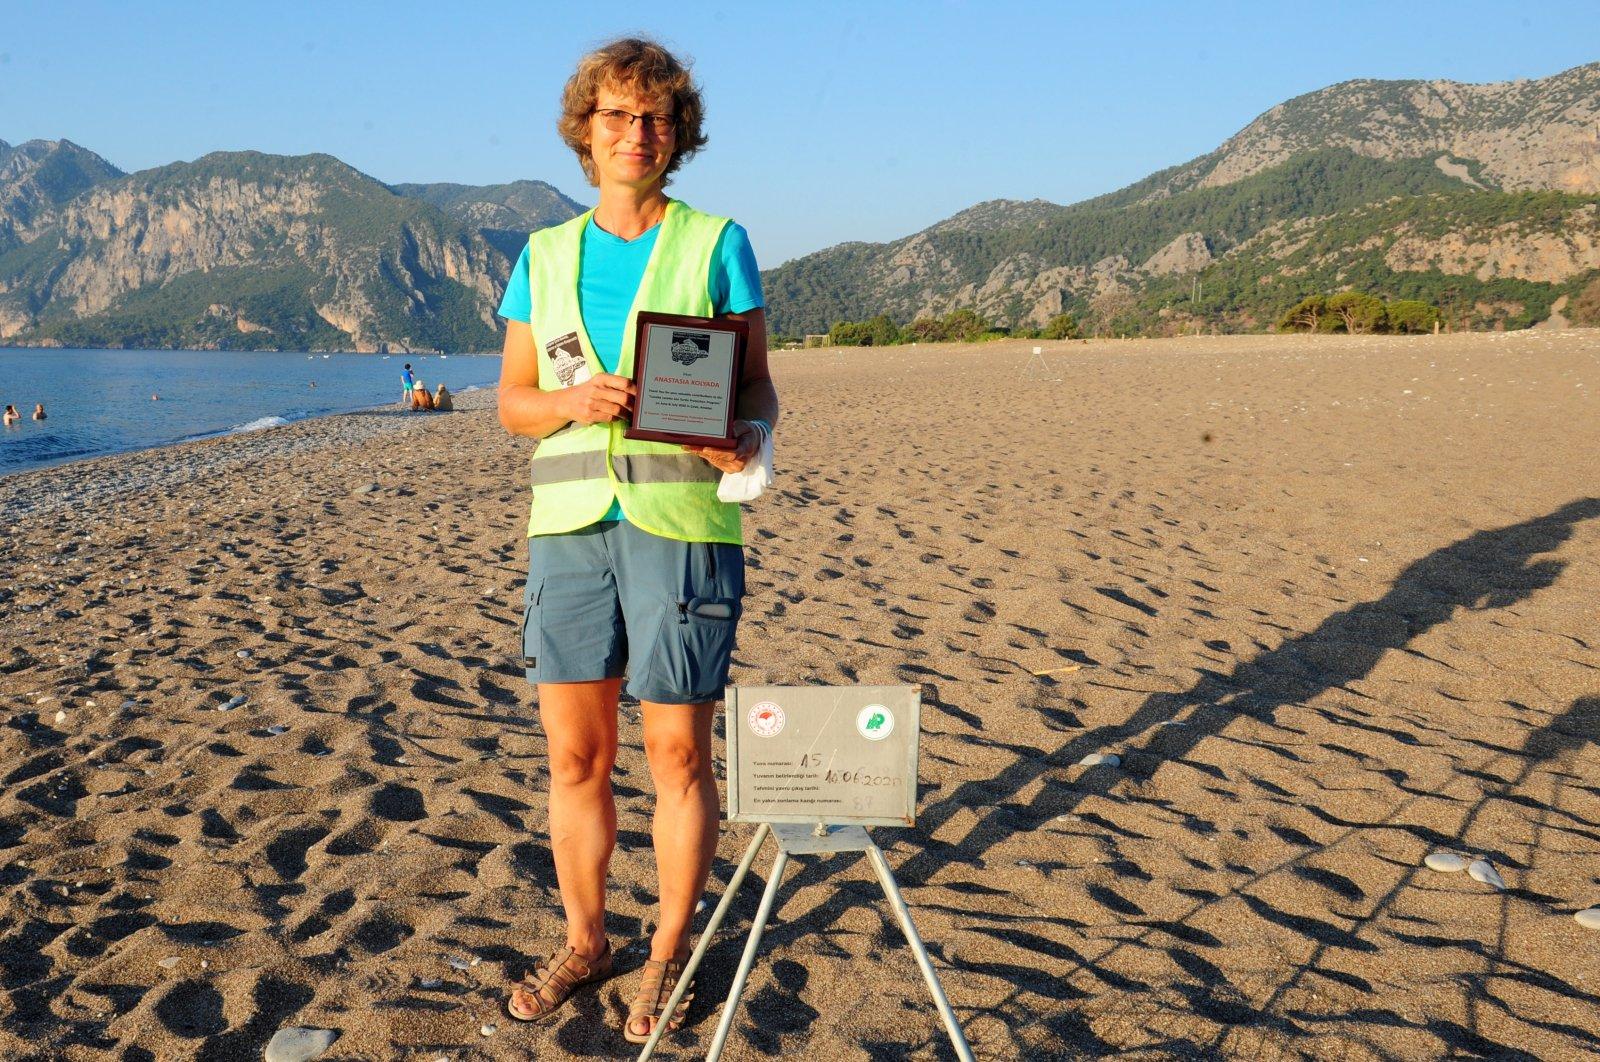 Anastasia Kolyada poses next to a Caretta caretta nest on Çıralı Beach, Antalya, July 22, 2020. (DHA Photo)